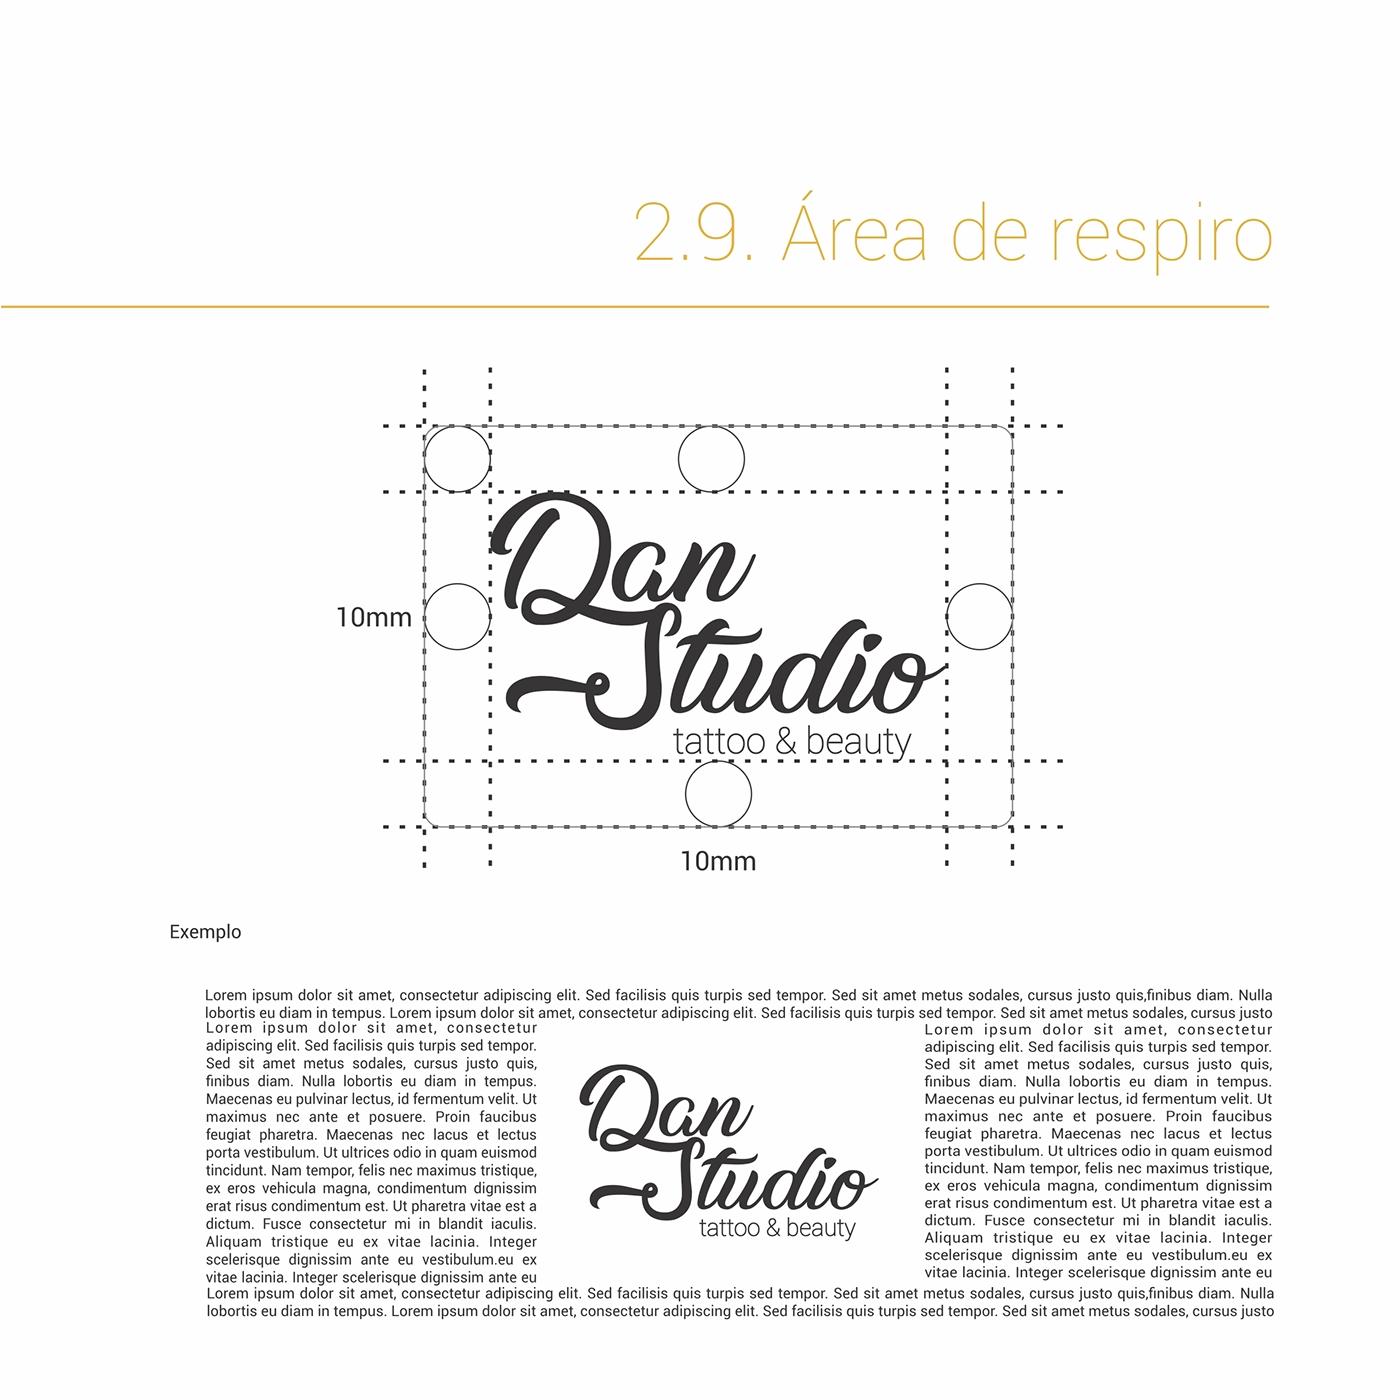 Dan Studio's Visual Identity Manual on Behance